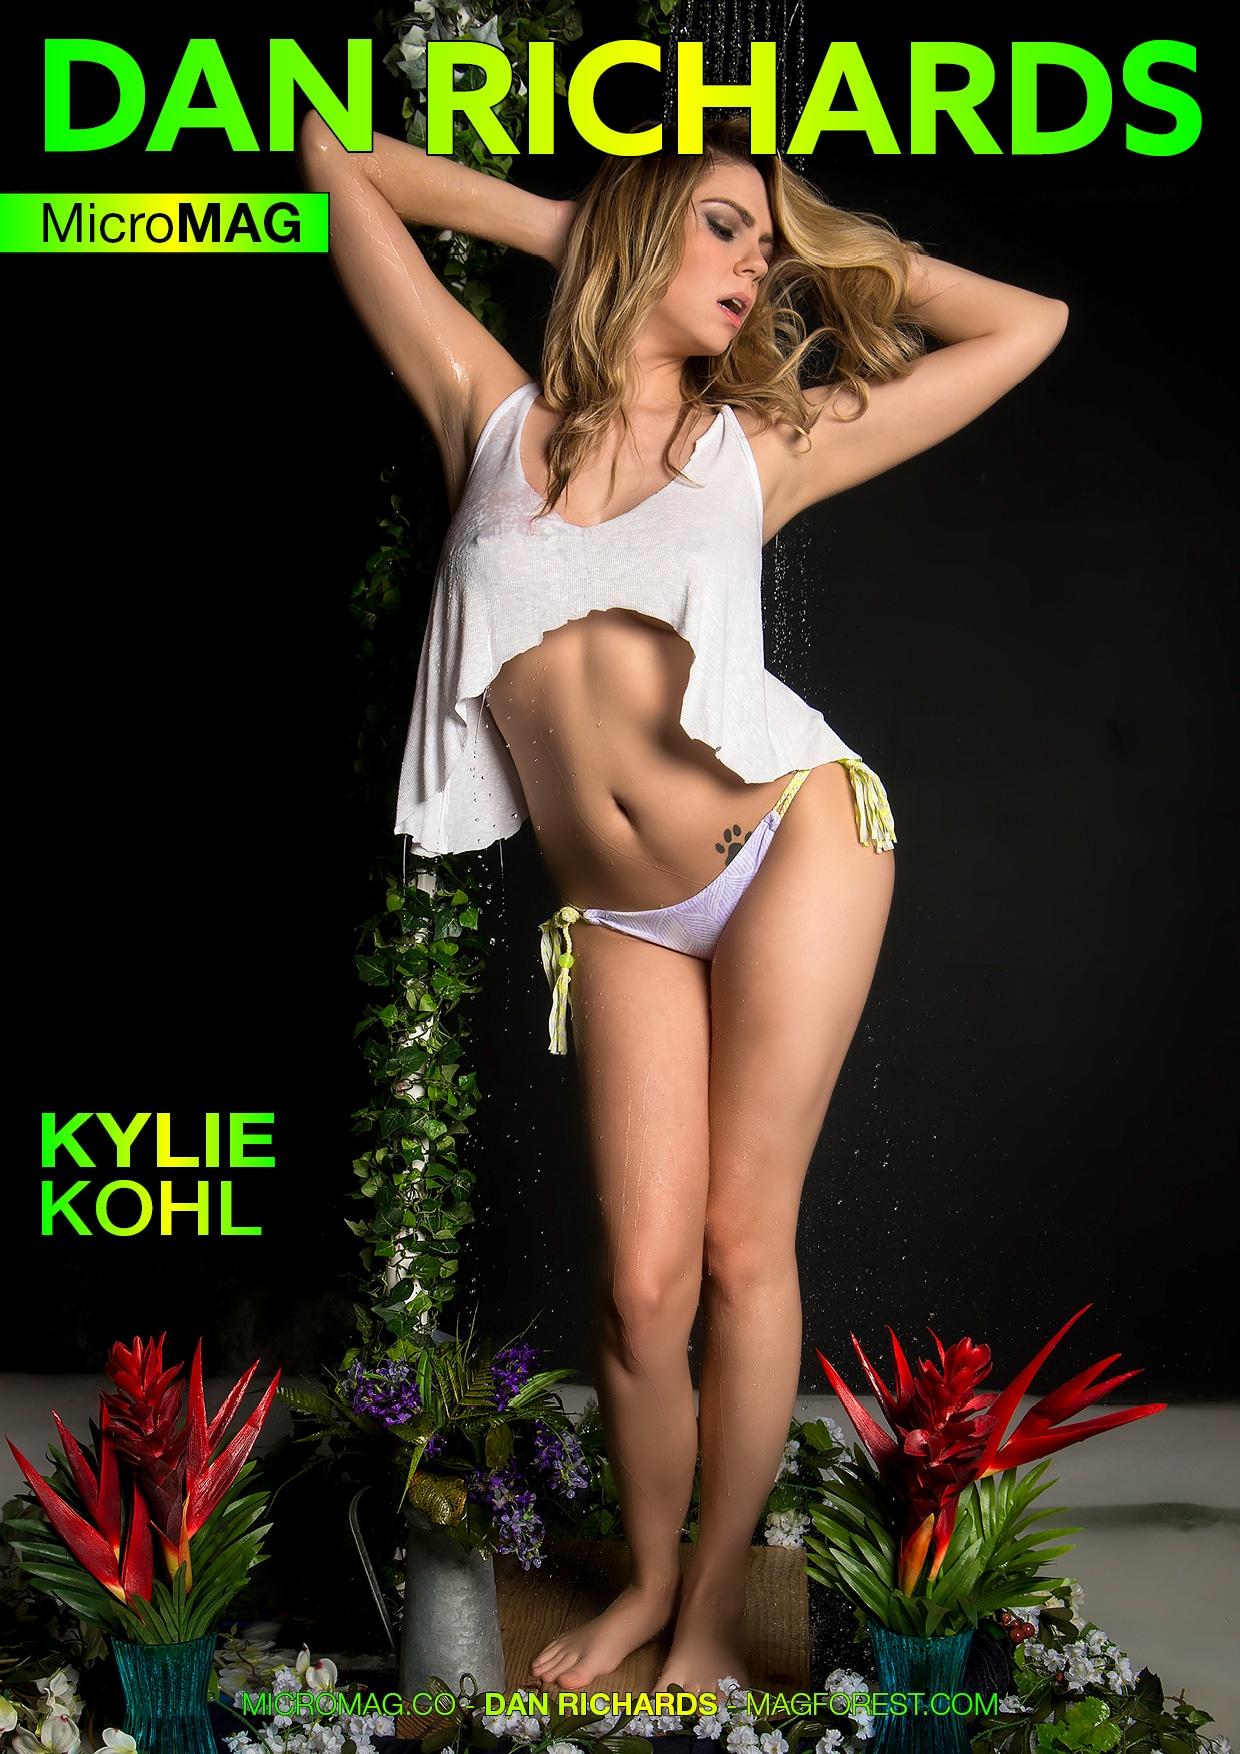 Dan Richards Micromag – Kylie Kohl – Issue 3